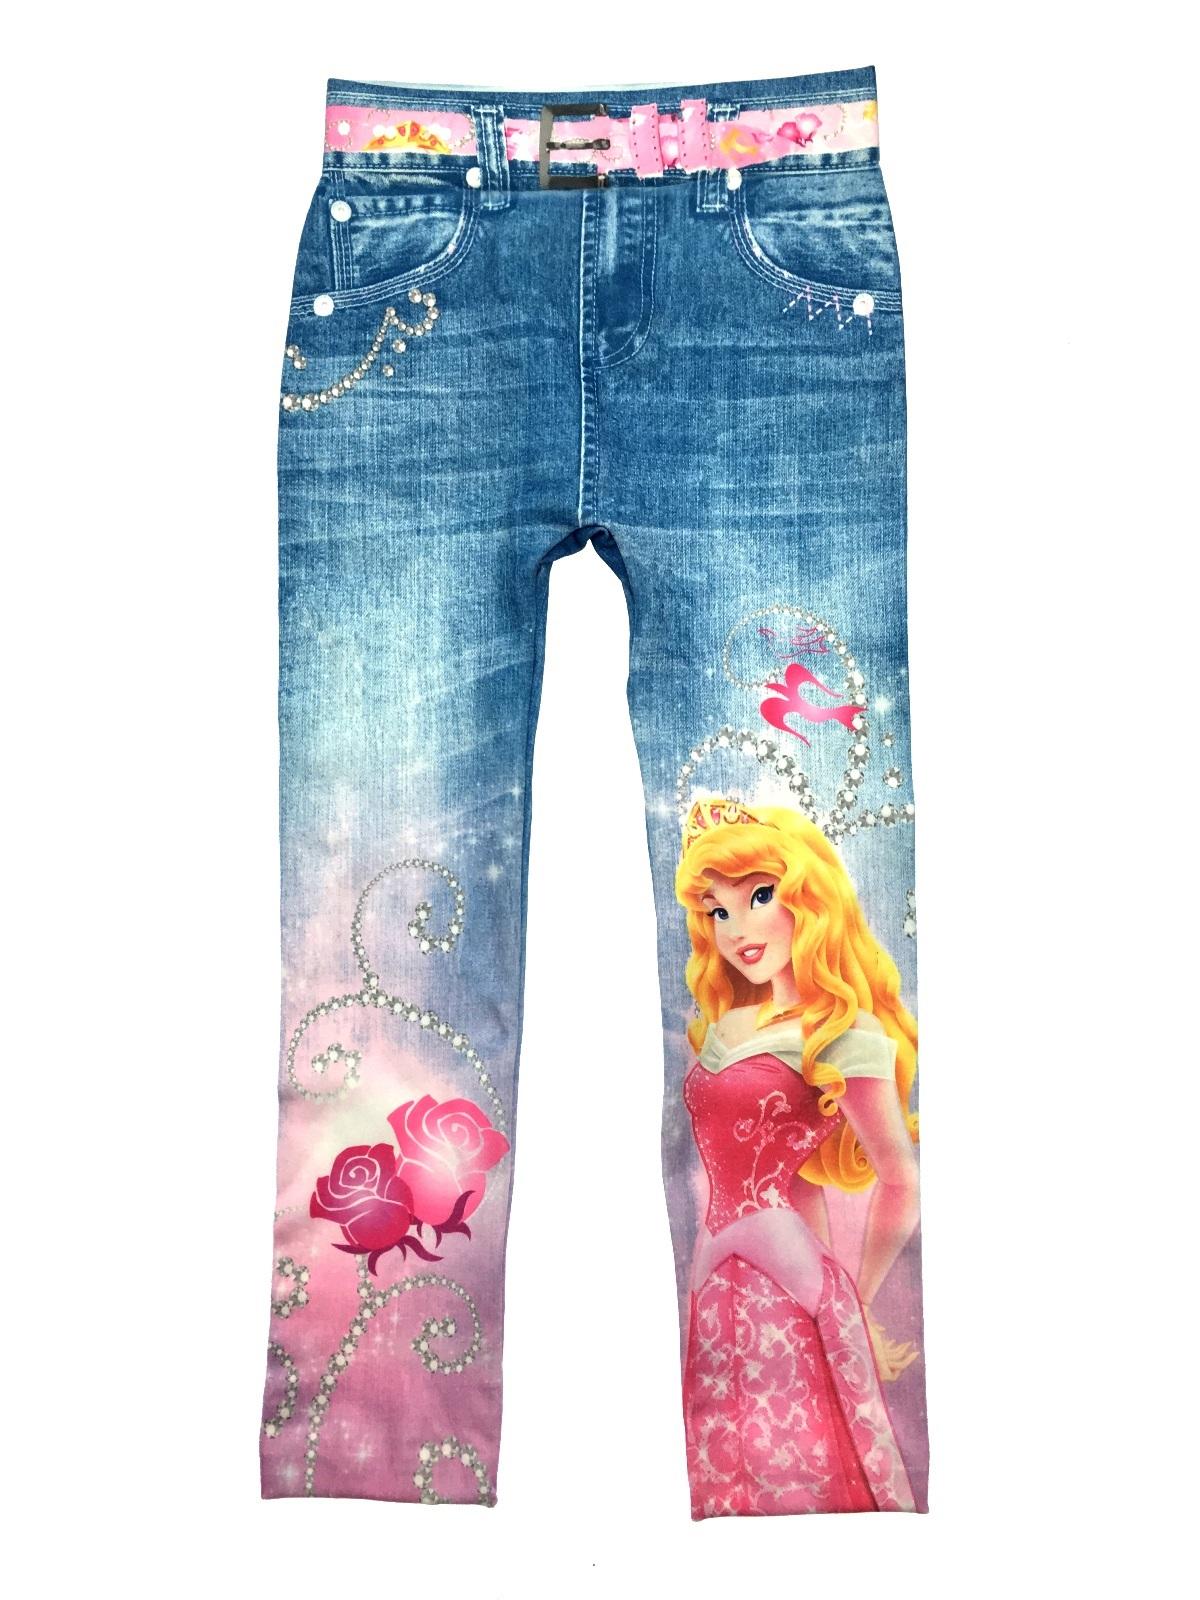 2nd Red Koleksi Jeans Slim Fit Wanita Terfavorit celana Jeans Slim Source Girls .